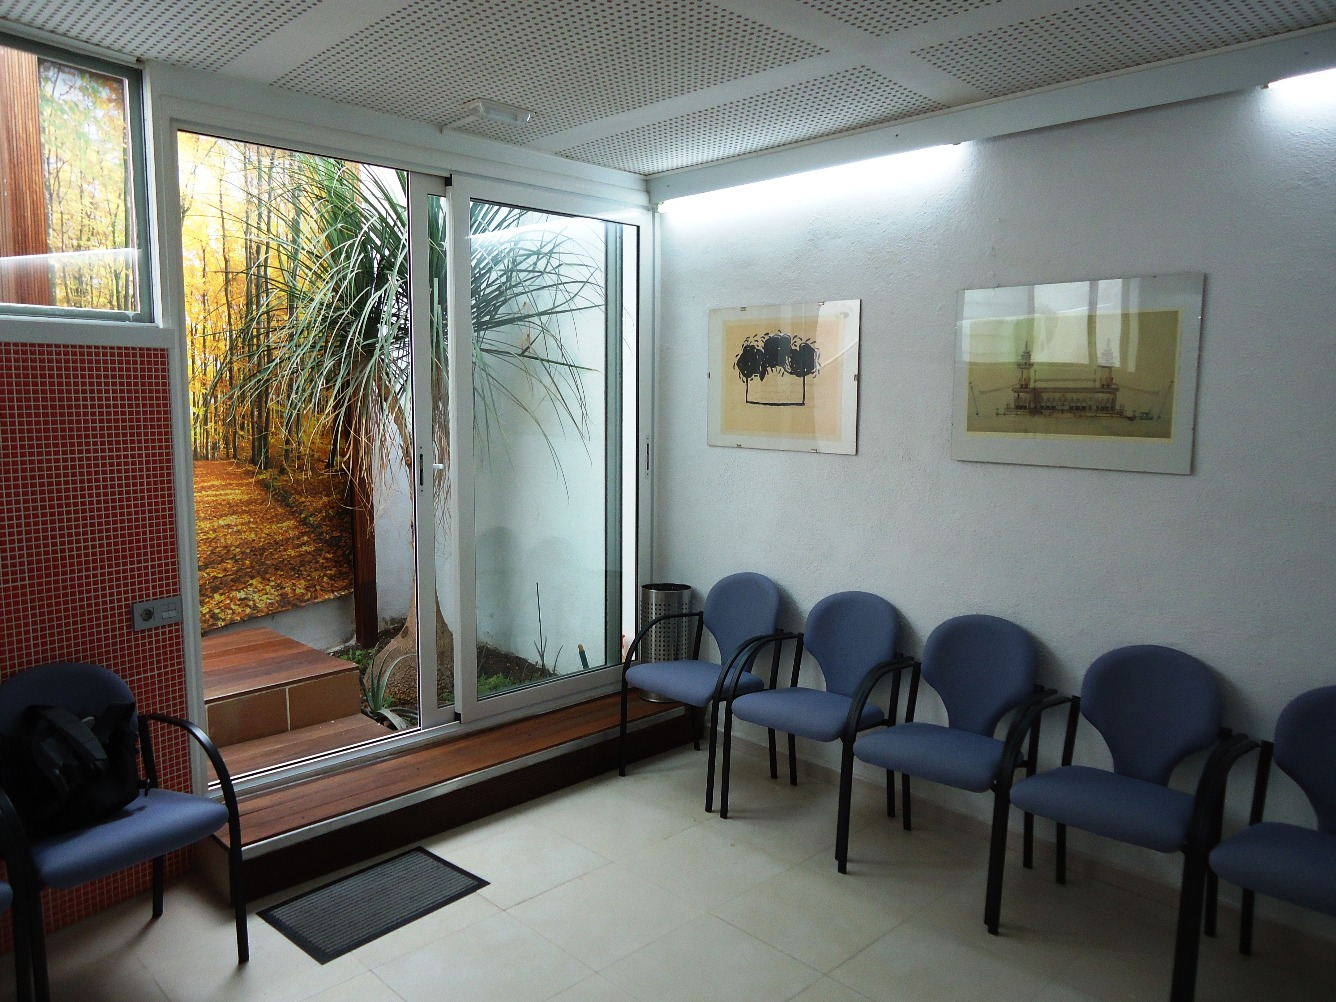 Alquiler Oficina  Sant quirze del vallès - centre. House solutions alquila oficina equipada en sant quirze.